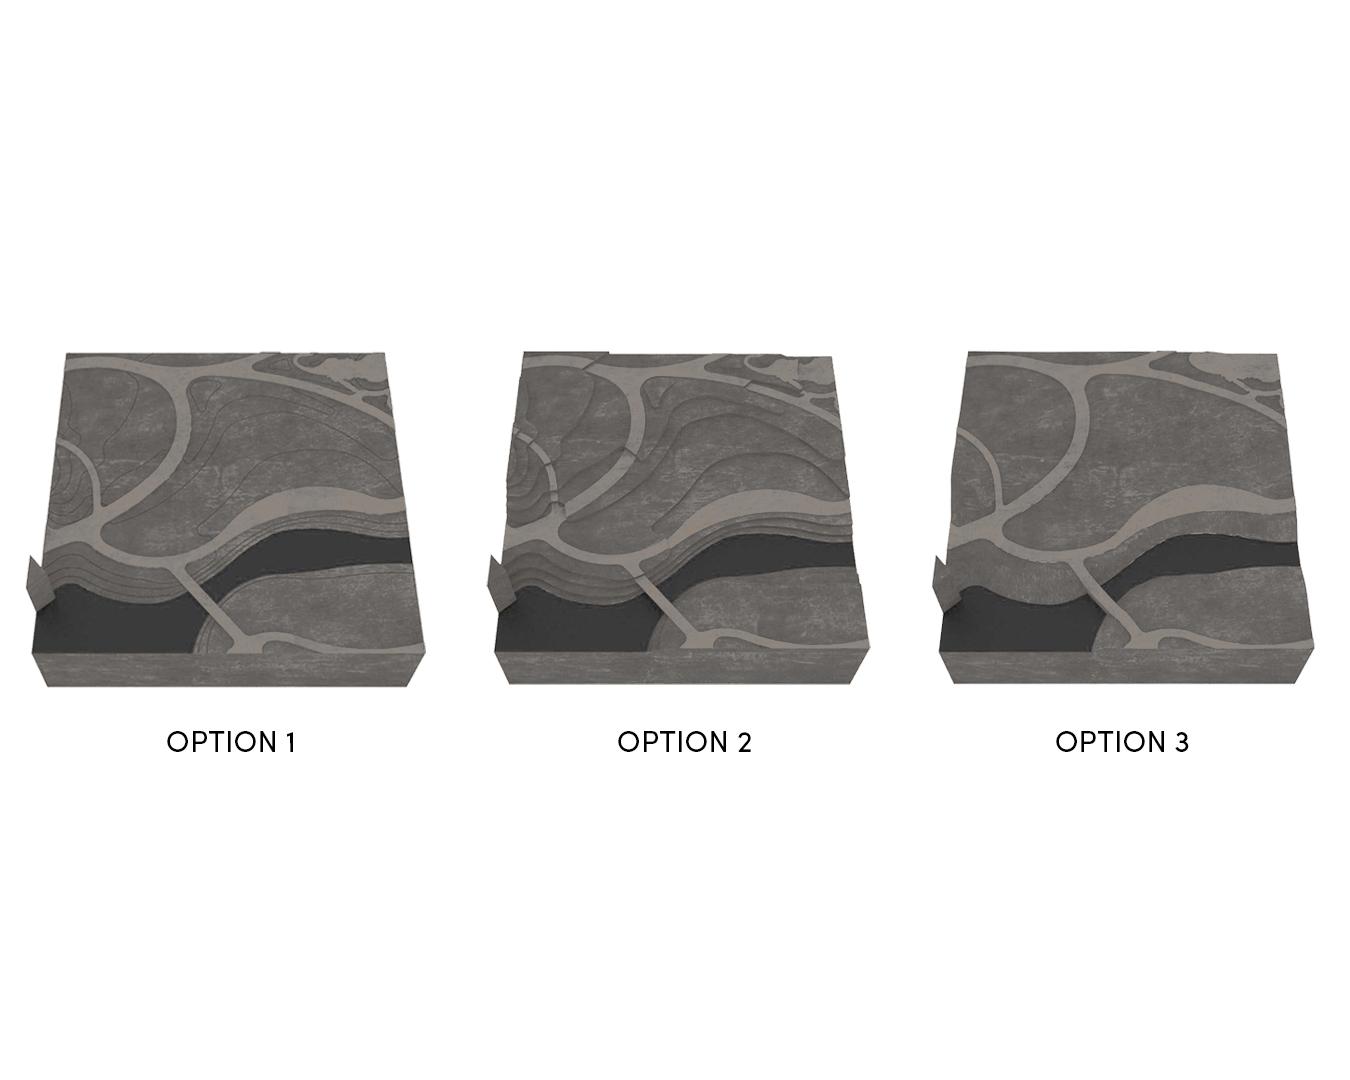 Topo Options.jpg